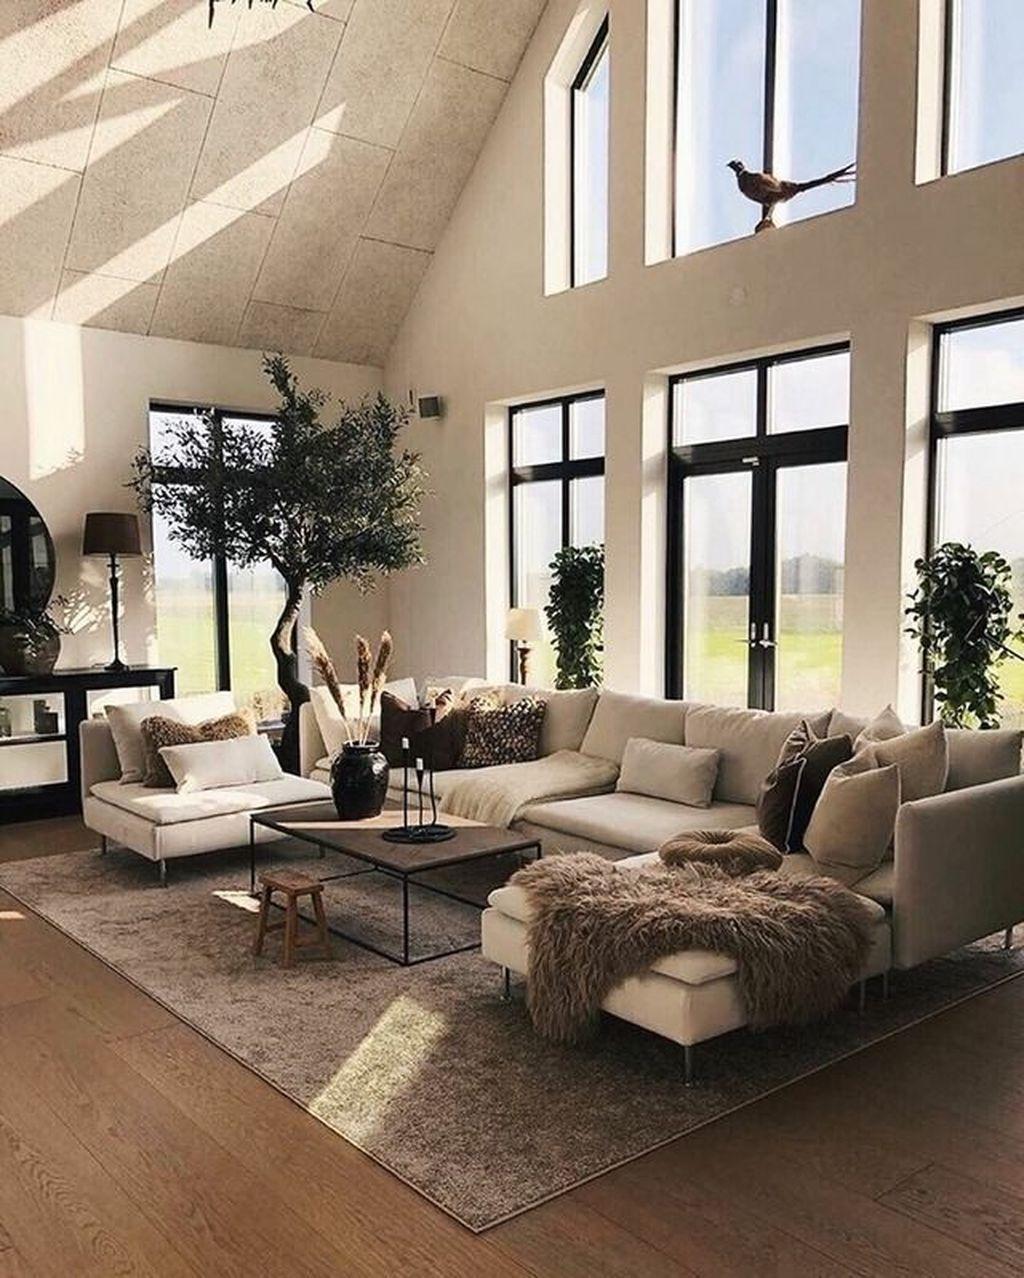 31 Admirable Modern Living Room Design Ideas You Should Copy Loft Inspiration Living Room Design Modern Loft Interiors